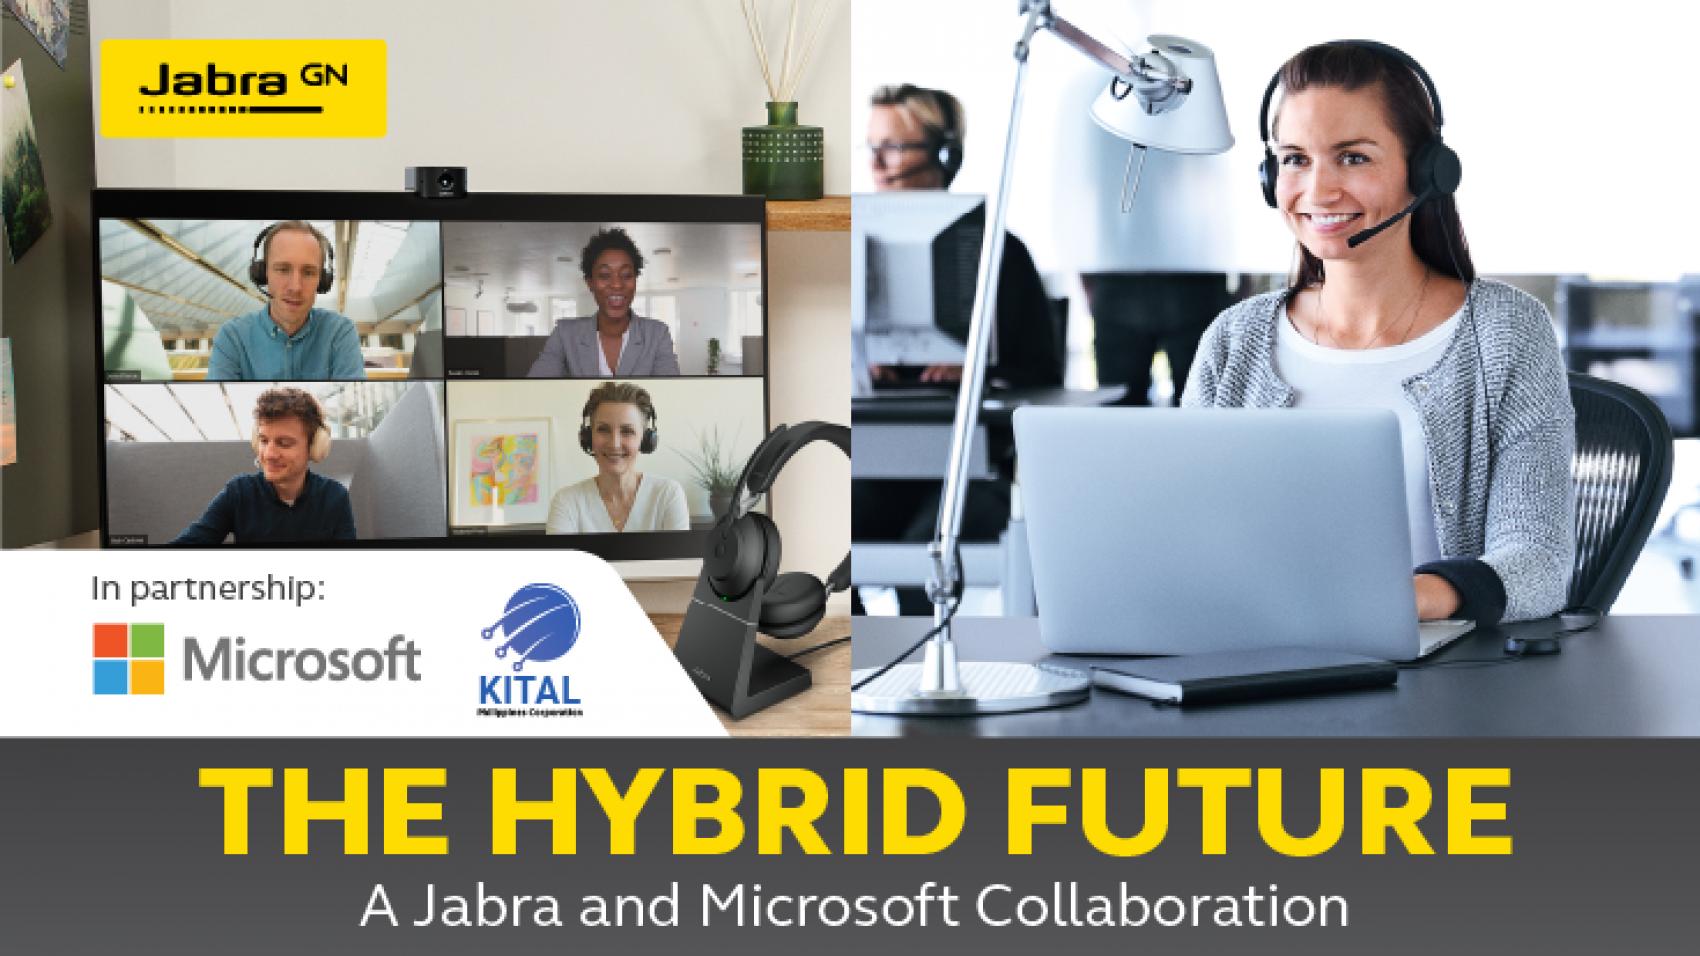 The Hybrid Future